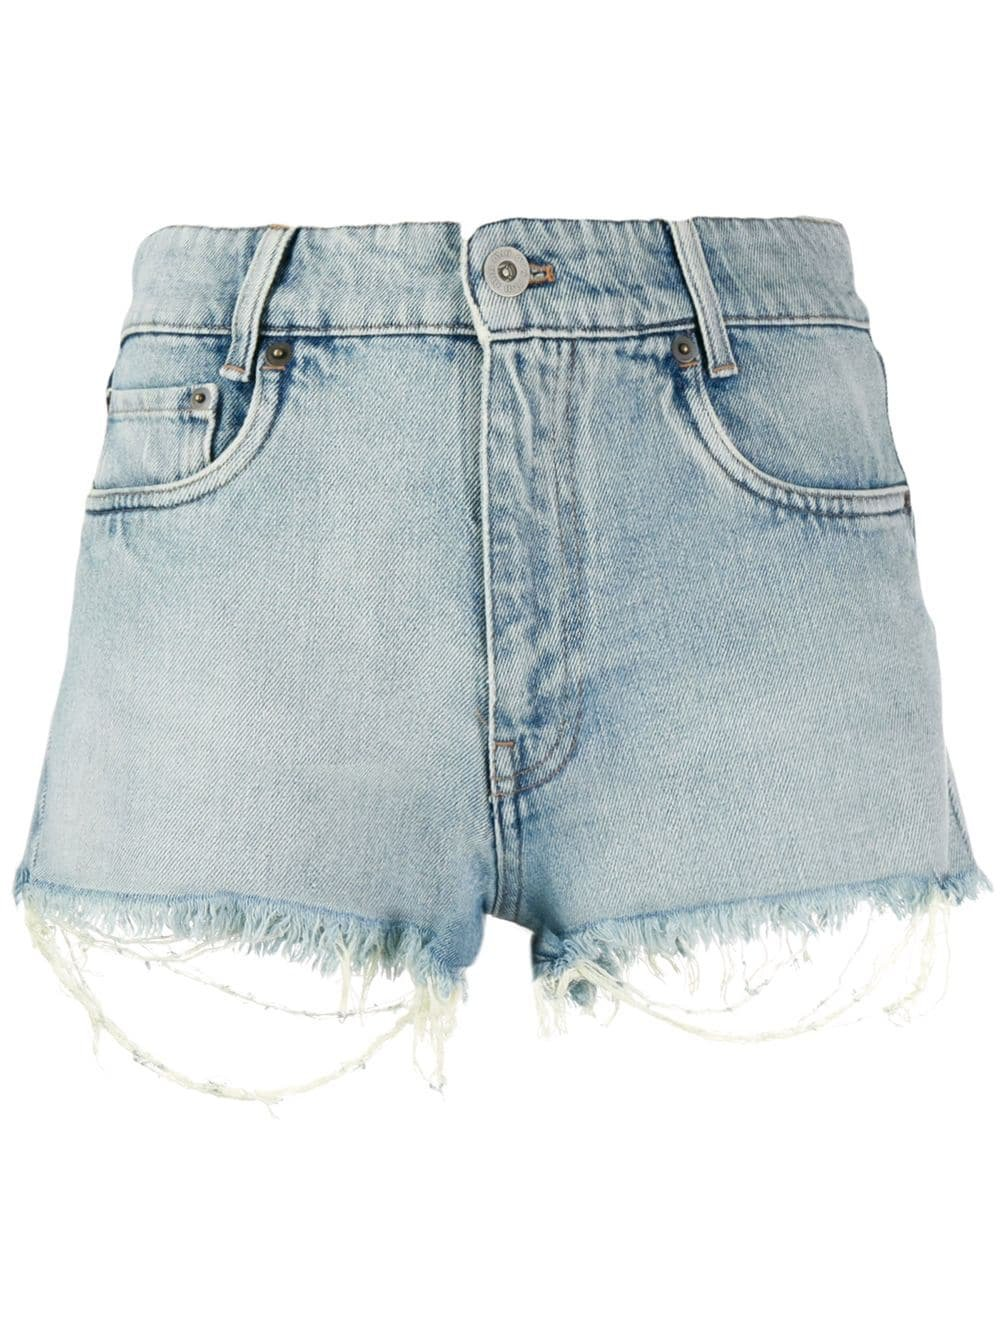 Blue Miu Miu Denim Shorts | Farfetch.com